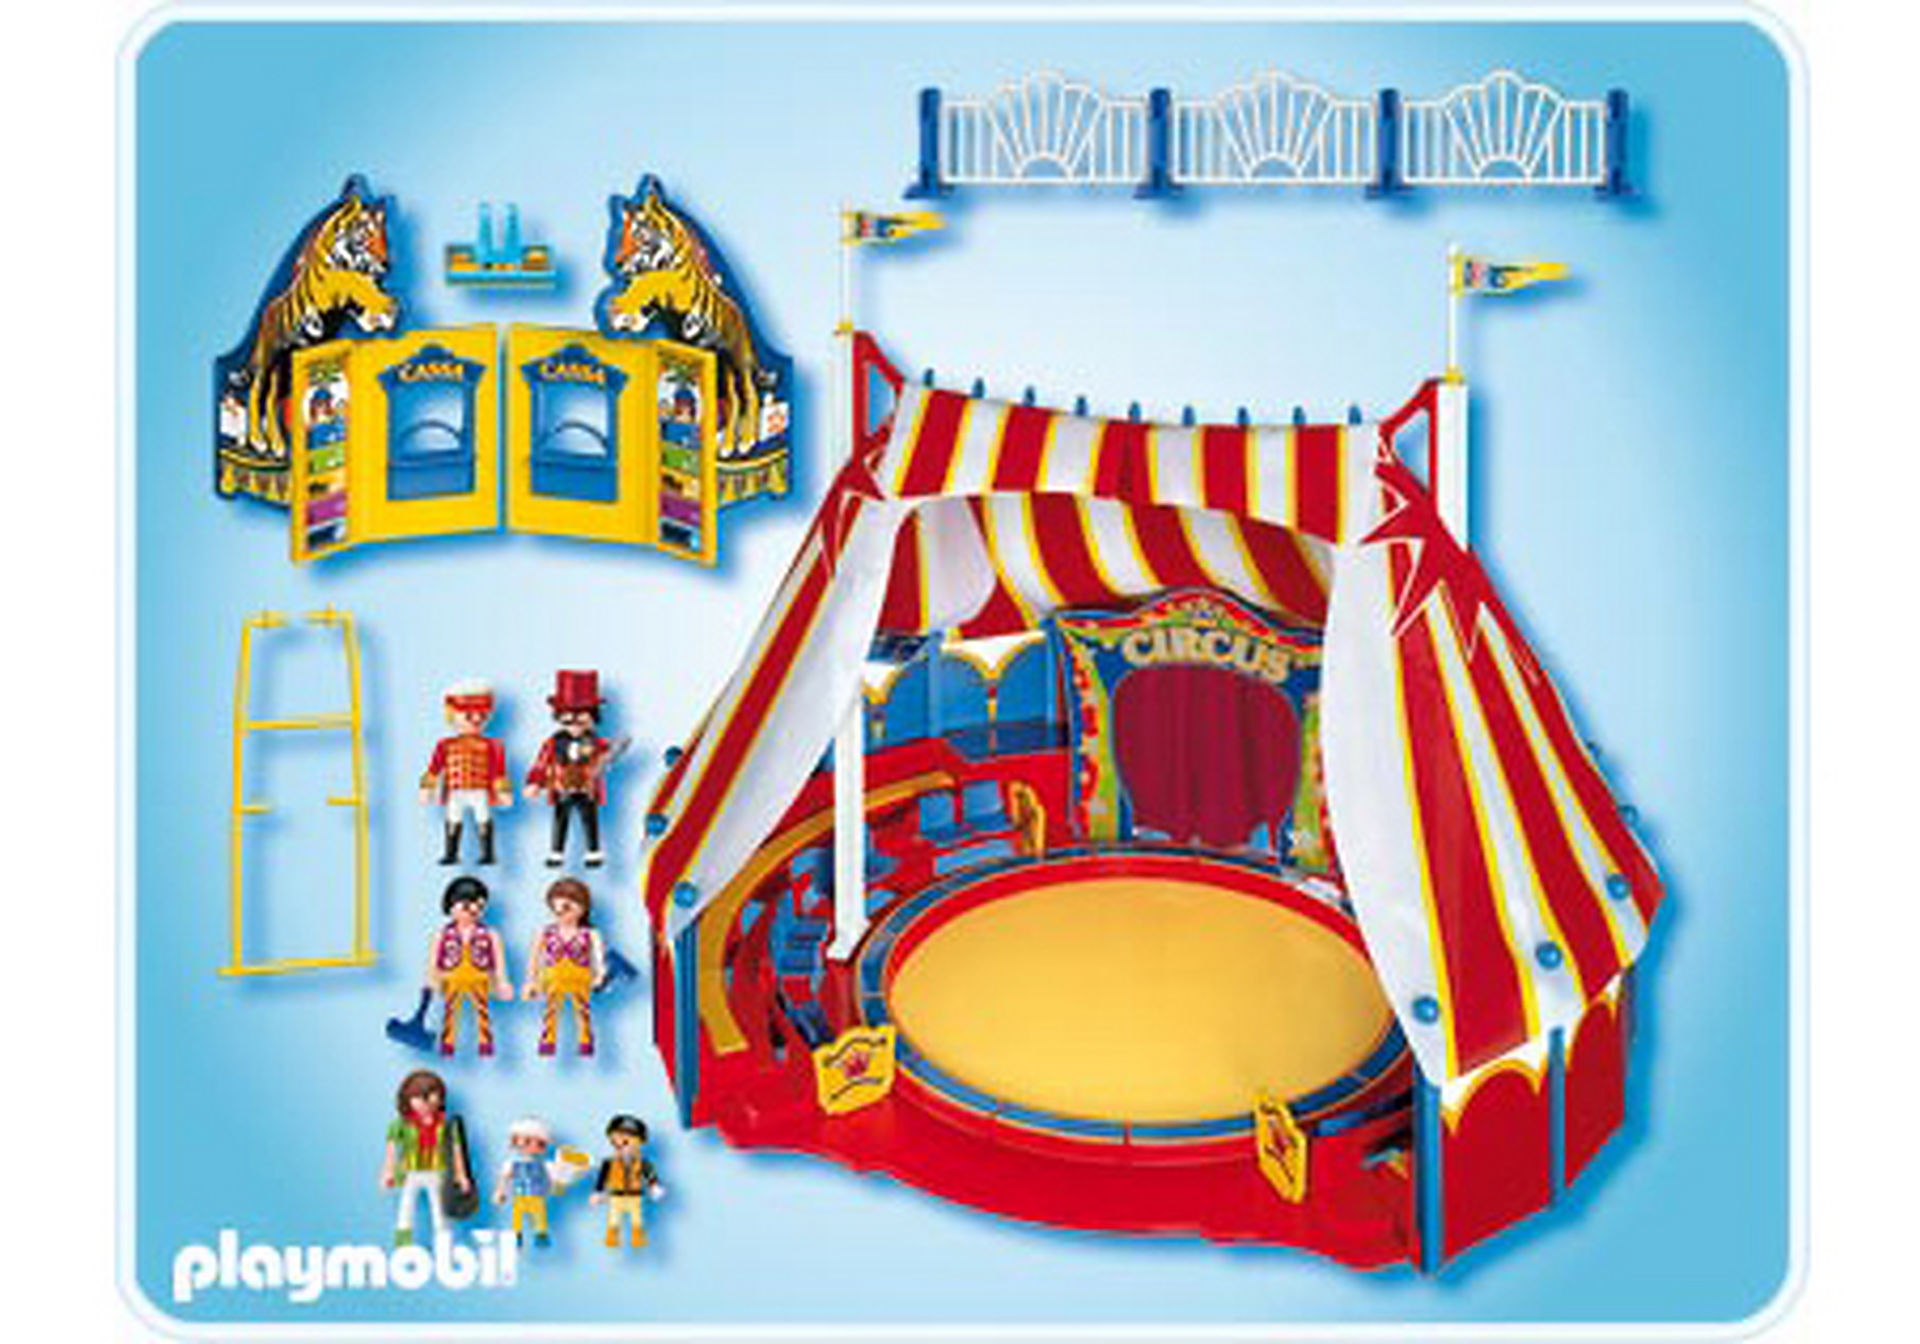 4230-A Grand chapiteau de cirque zoom image2